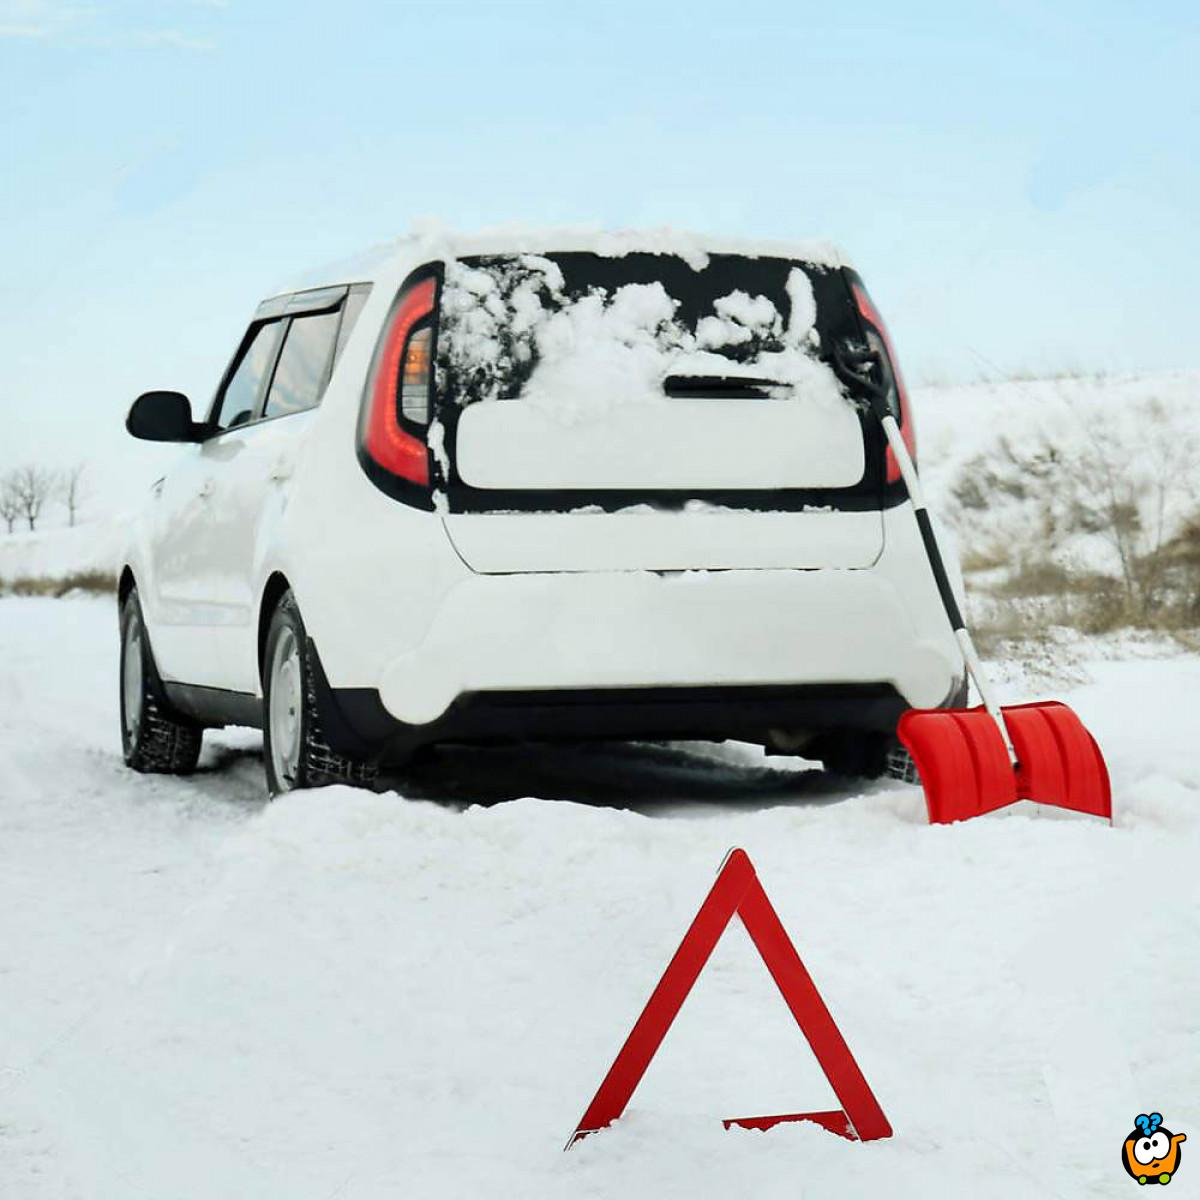 Mali sigurnosni trougao za auto